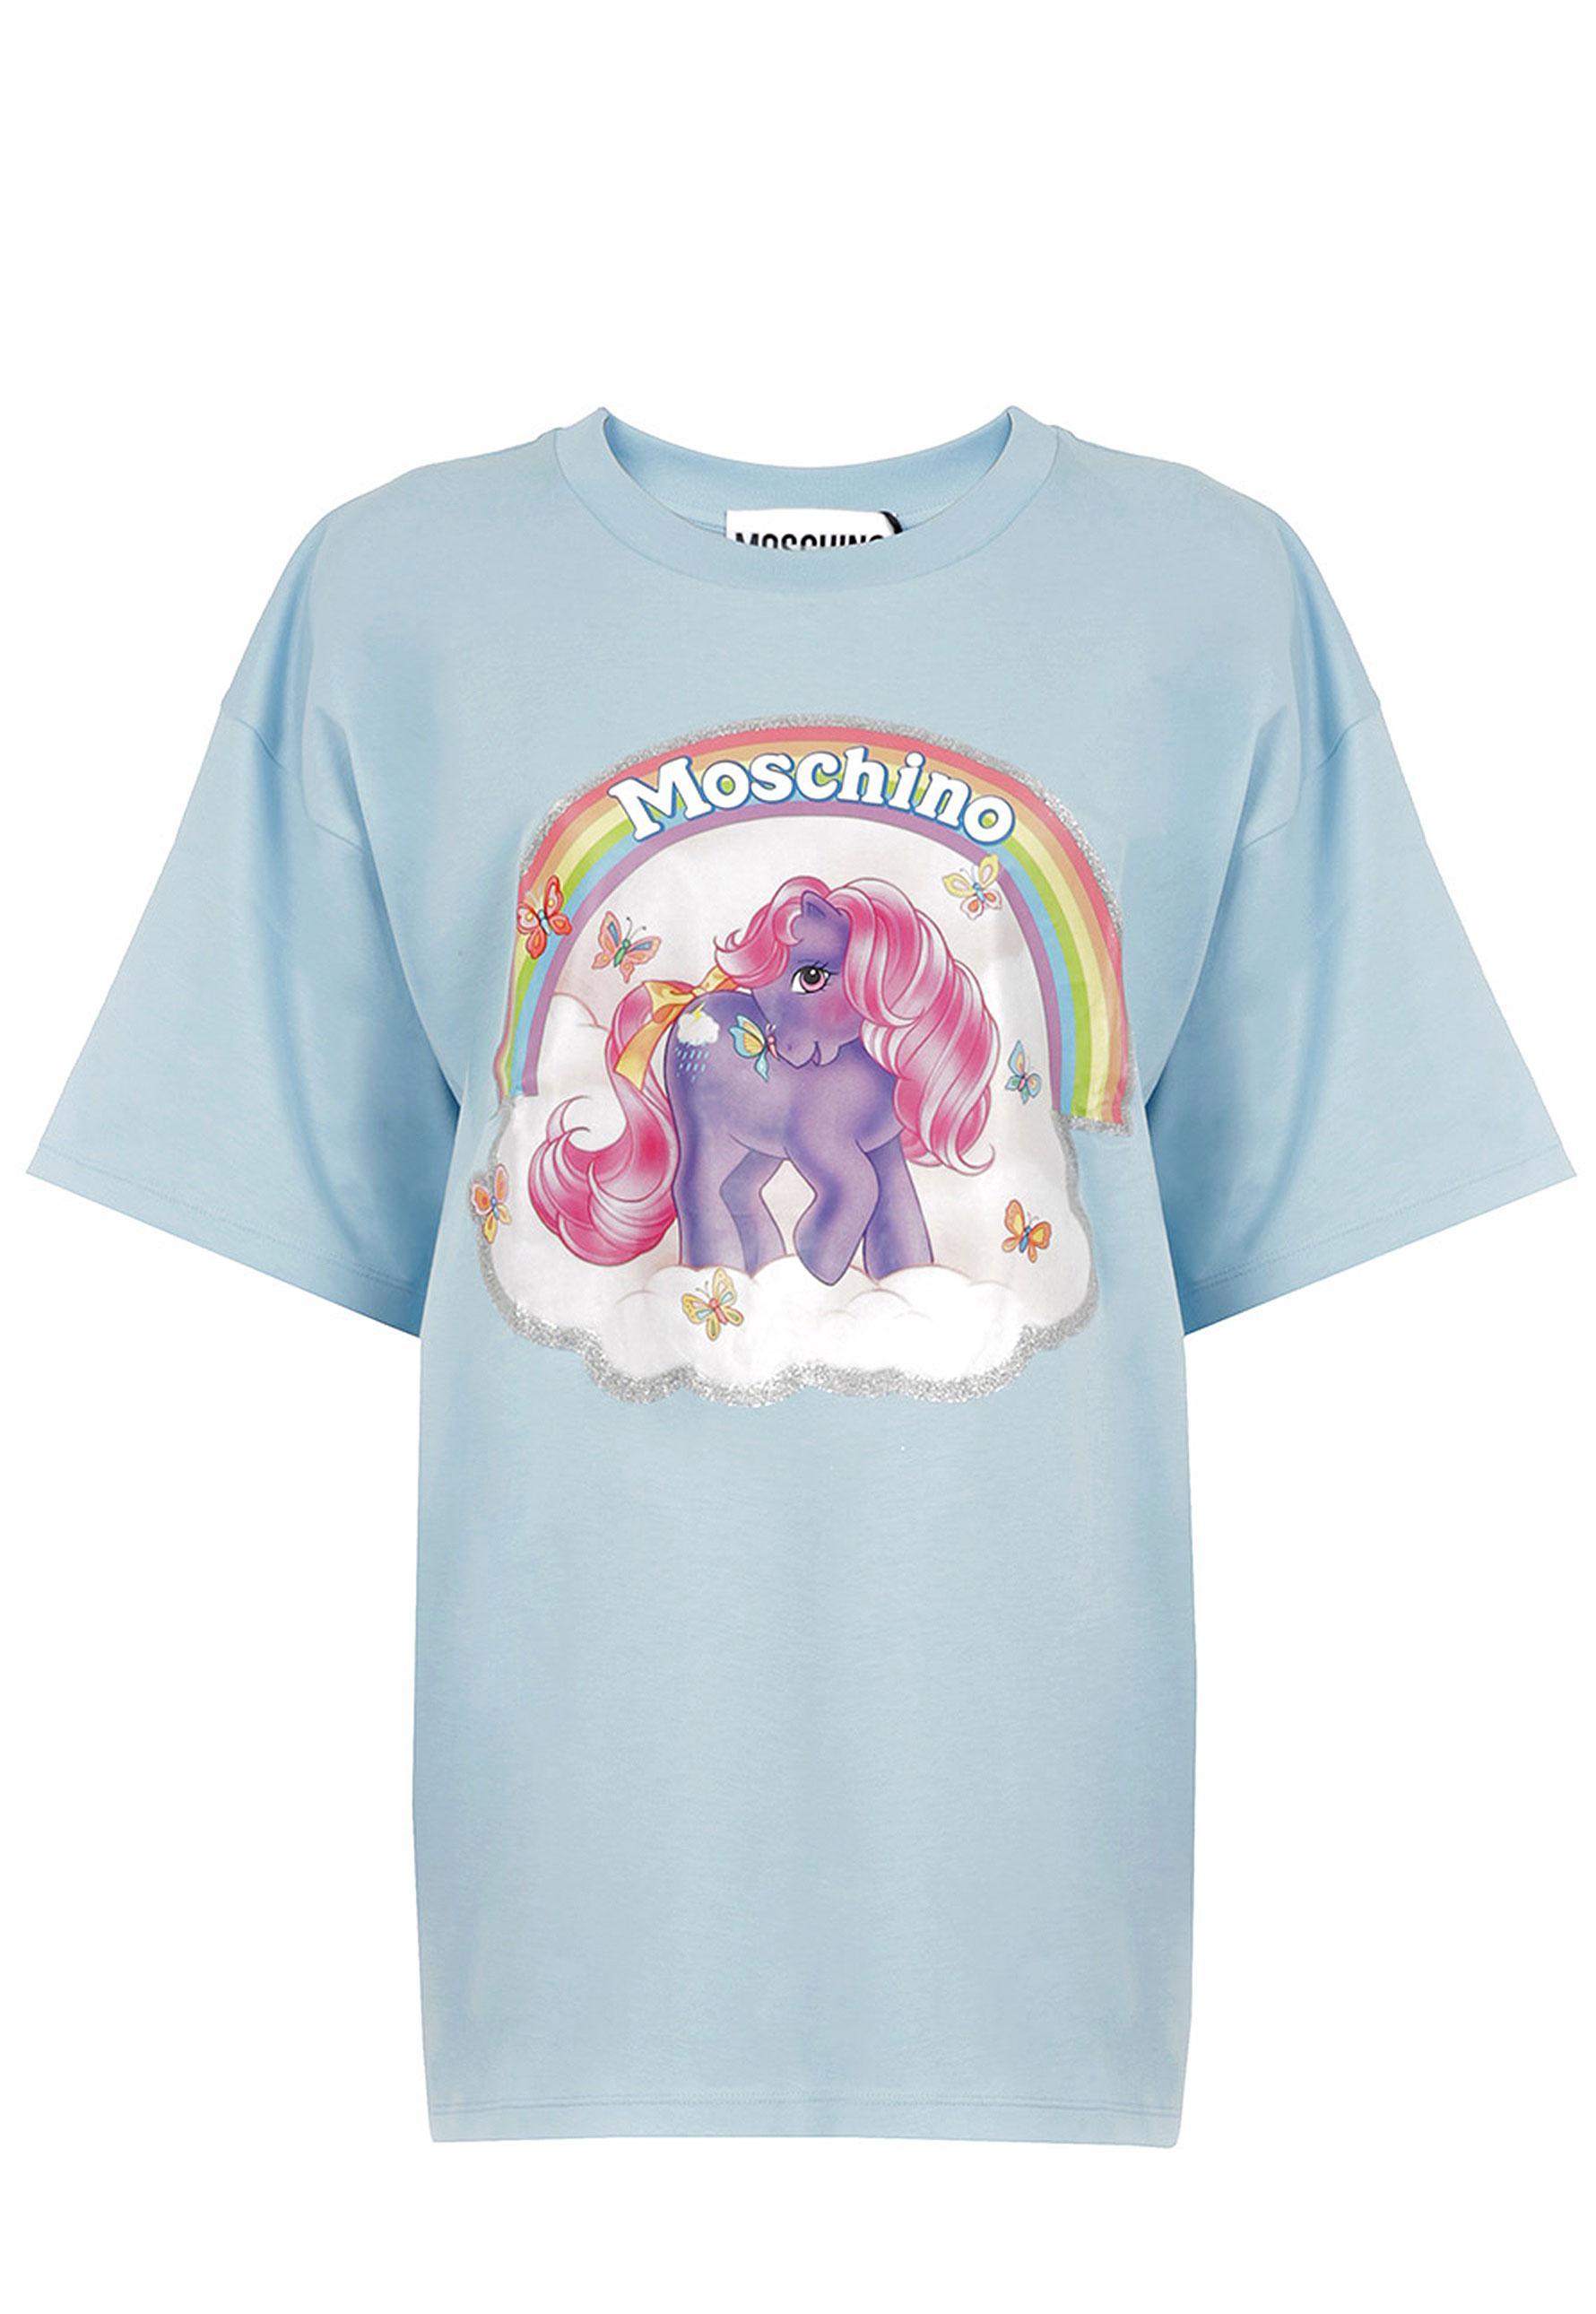 445b4adb6f6 Lyst - Moschino My Little Pony Oversized T-shirt Light Blue in Blue